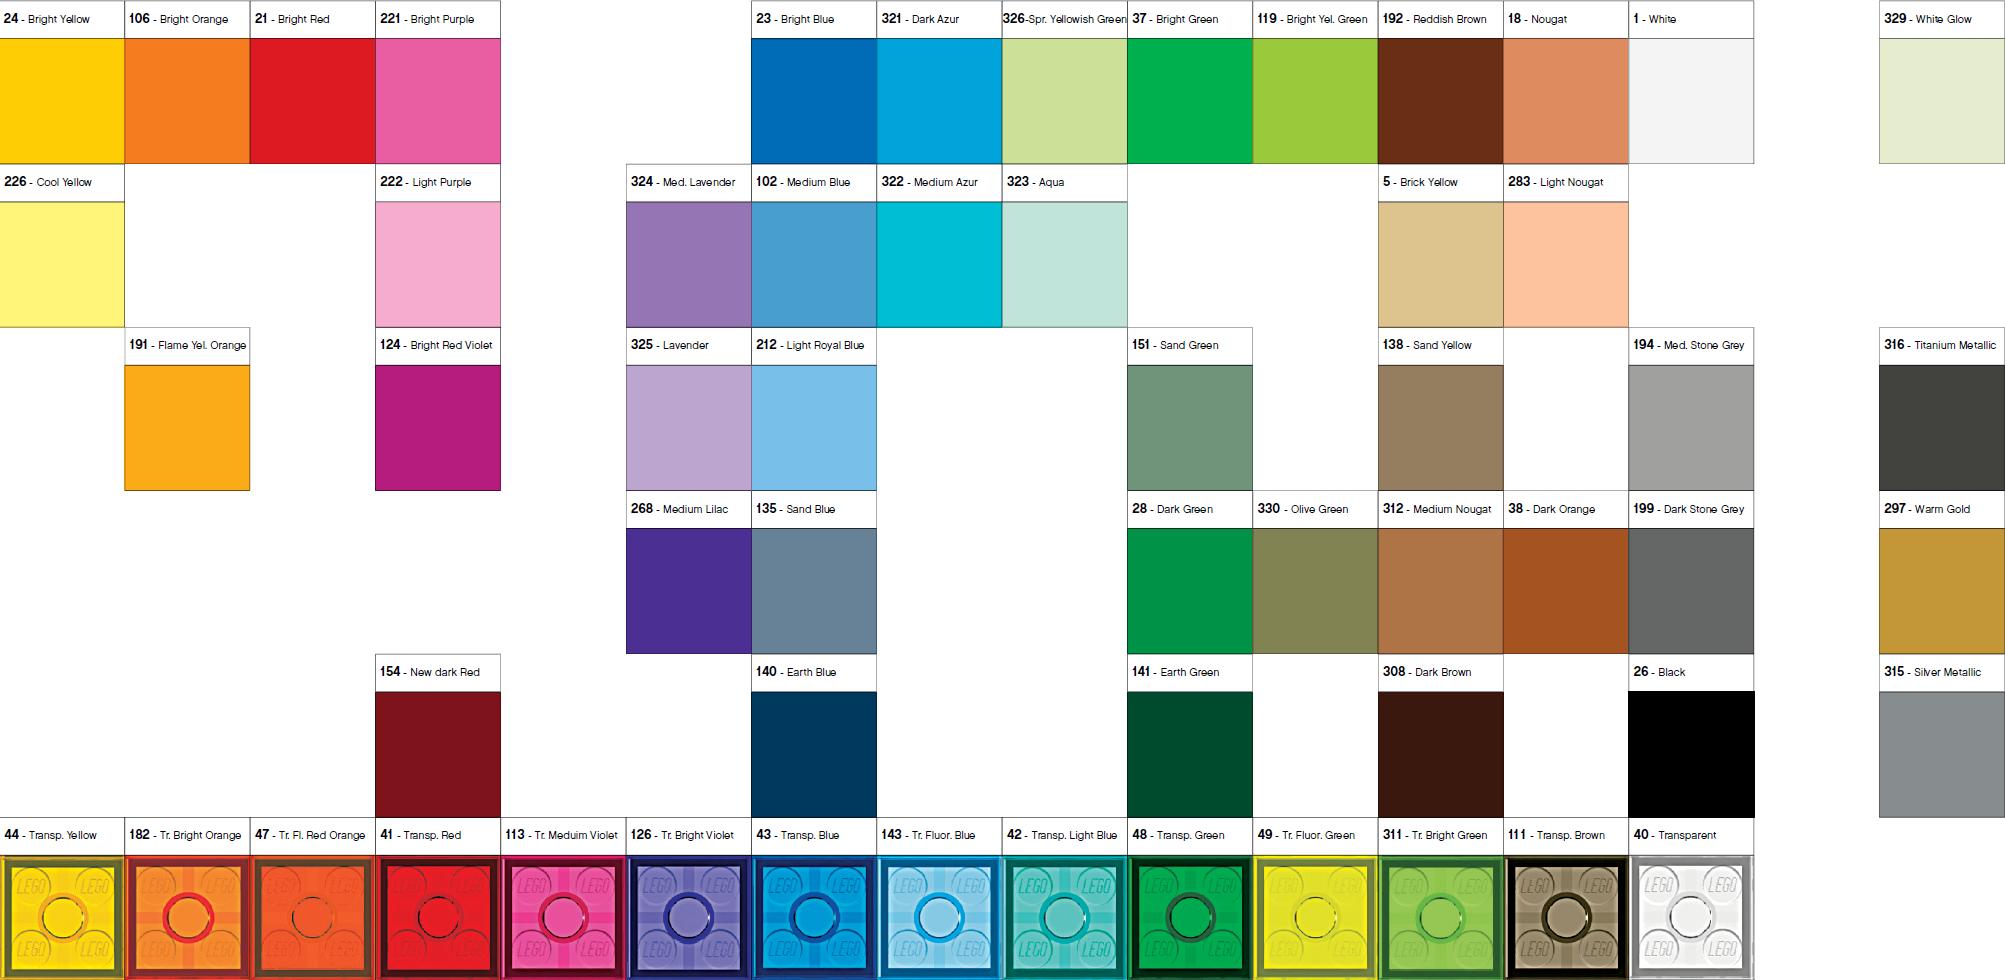 Moulding colour palette 2016 | Brickset: LEGO set guide ...